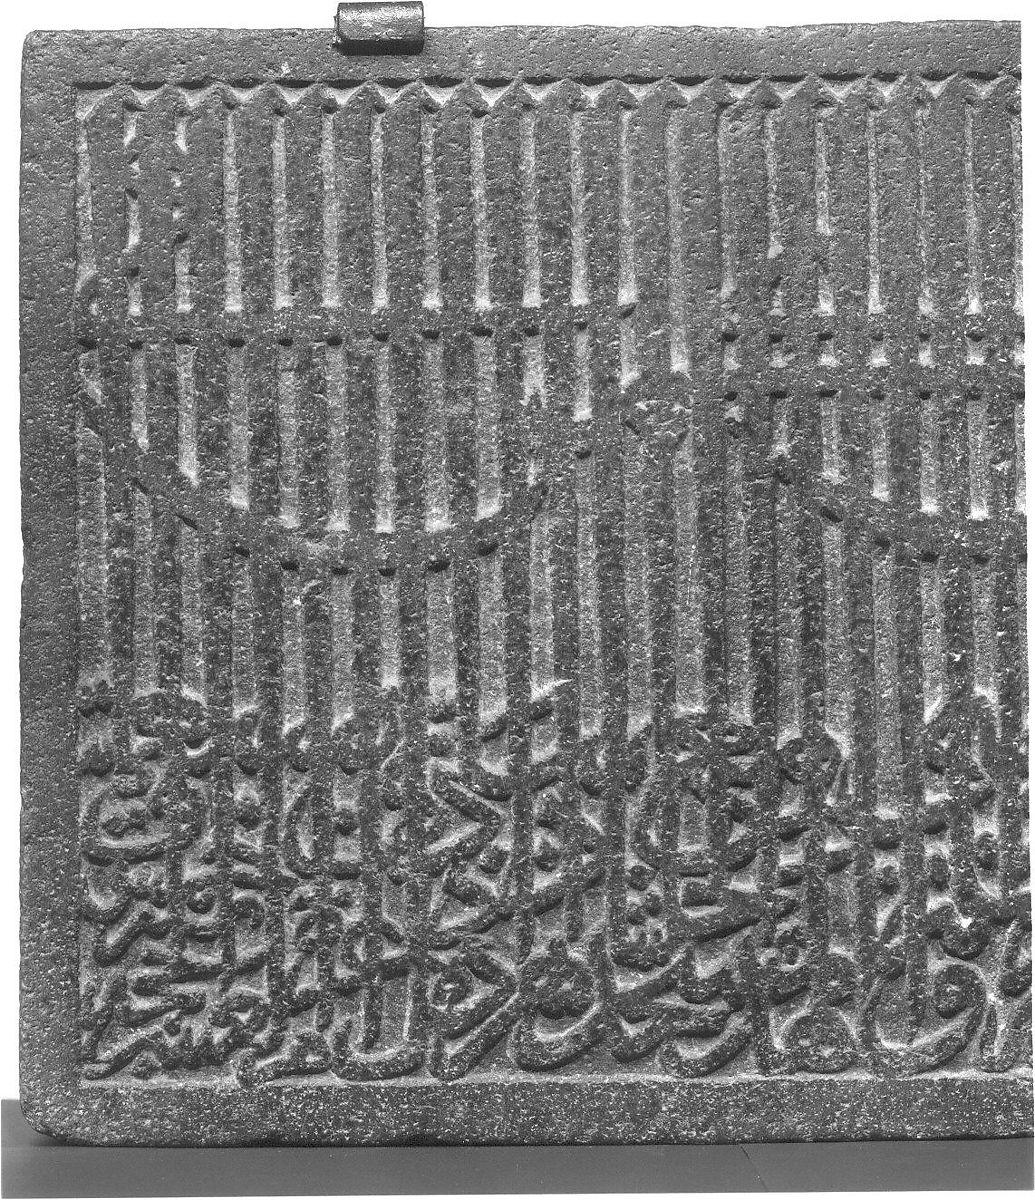 main-image (9).jpg